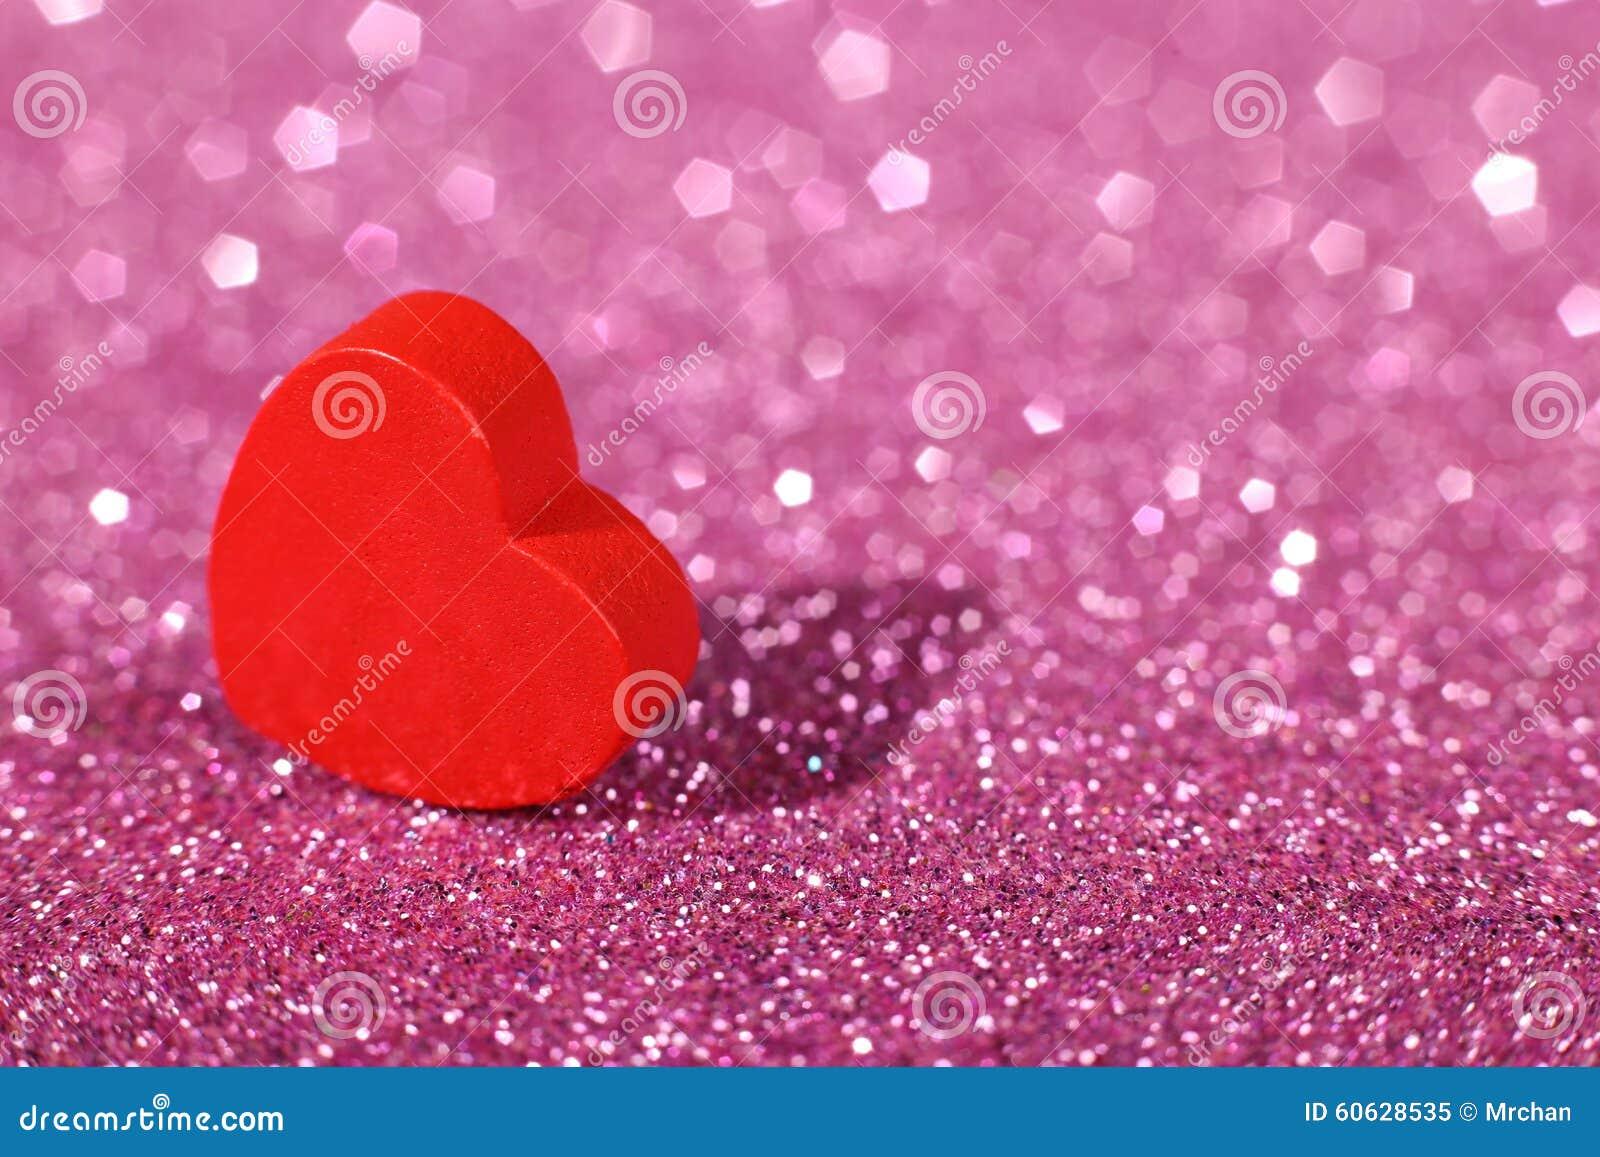 Valentine's Day Background Stock Photo